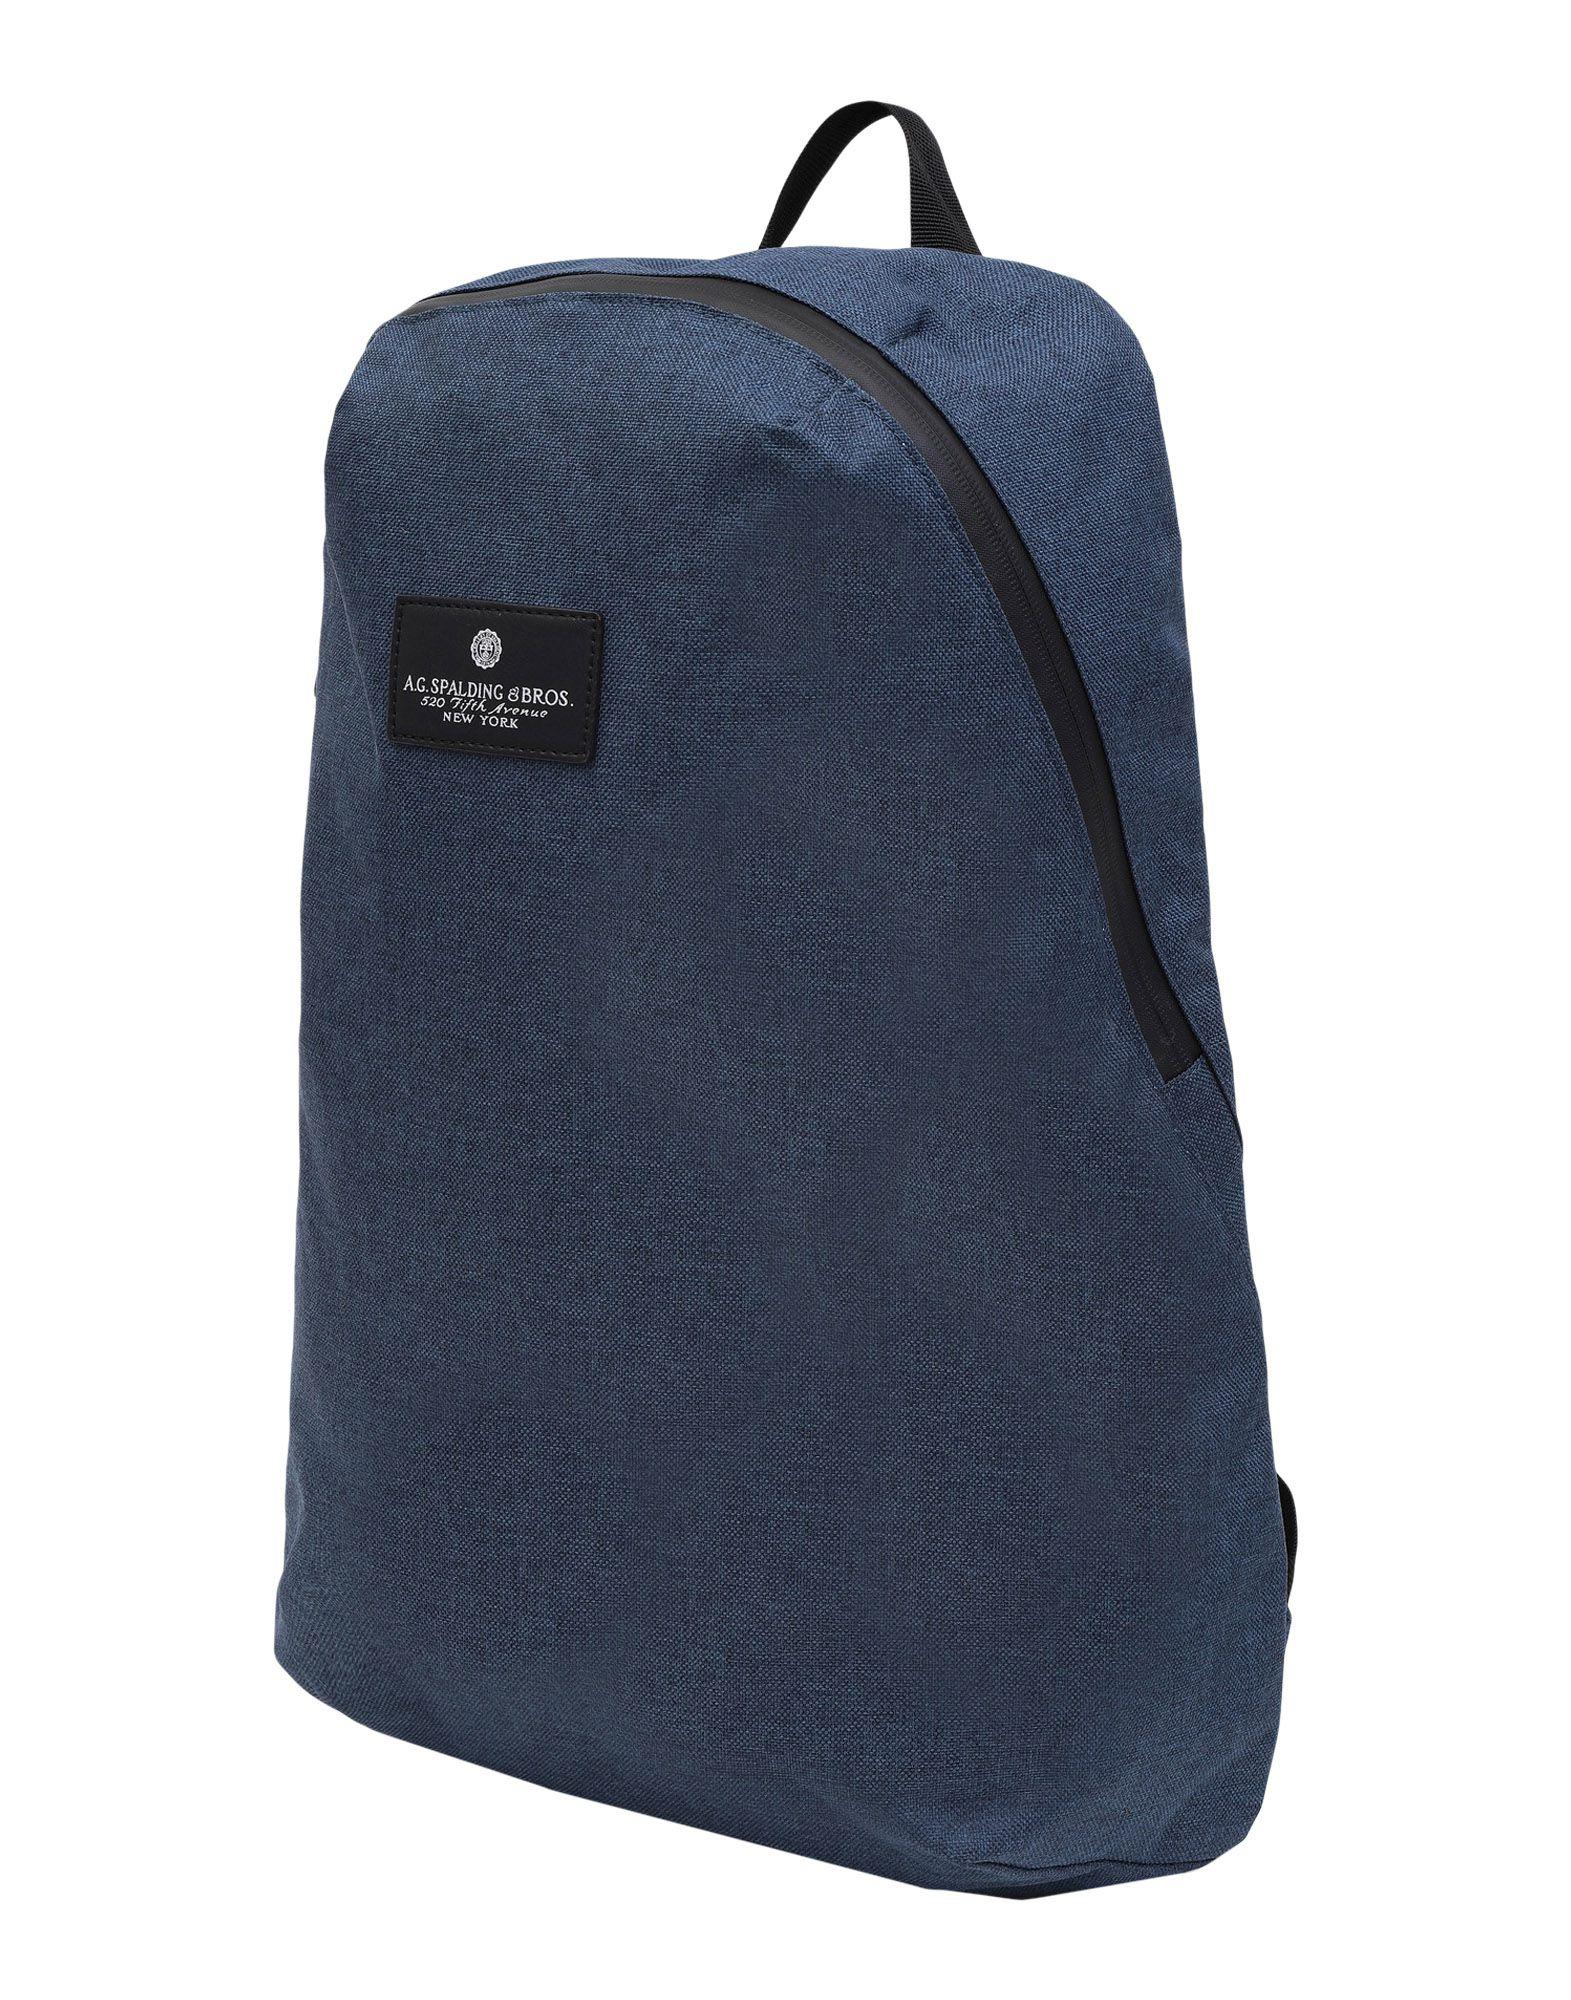 A.G. SPALDING & BROS. 520 FIFTH AVENUE New York Рюкзаки и сумки на пояс spalding spalding баскетбол материал nba пу no 7 lanqiu74 946y